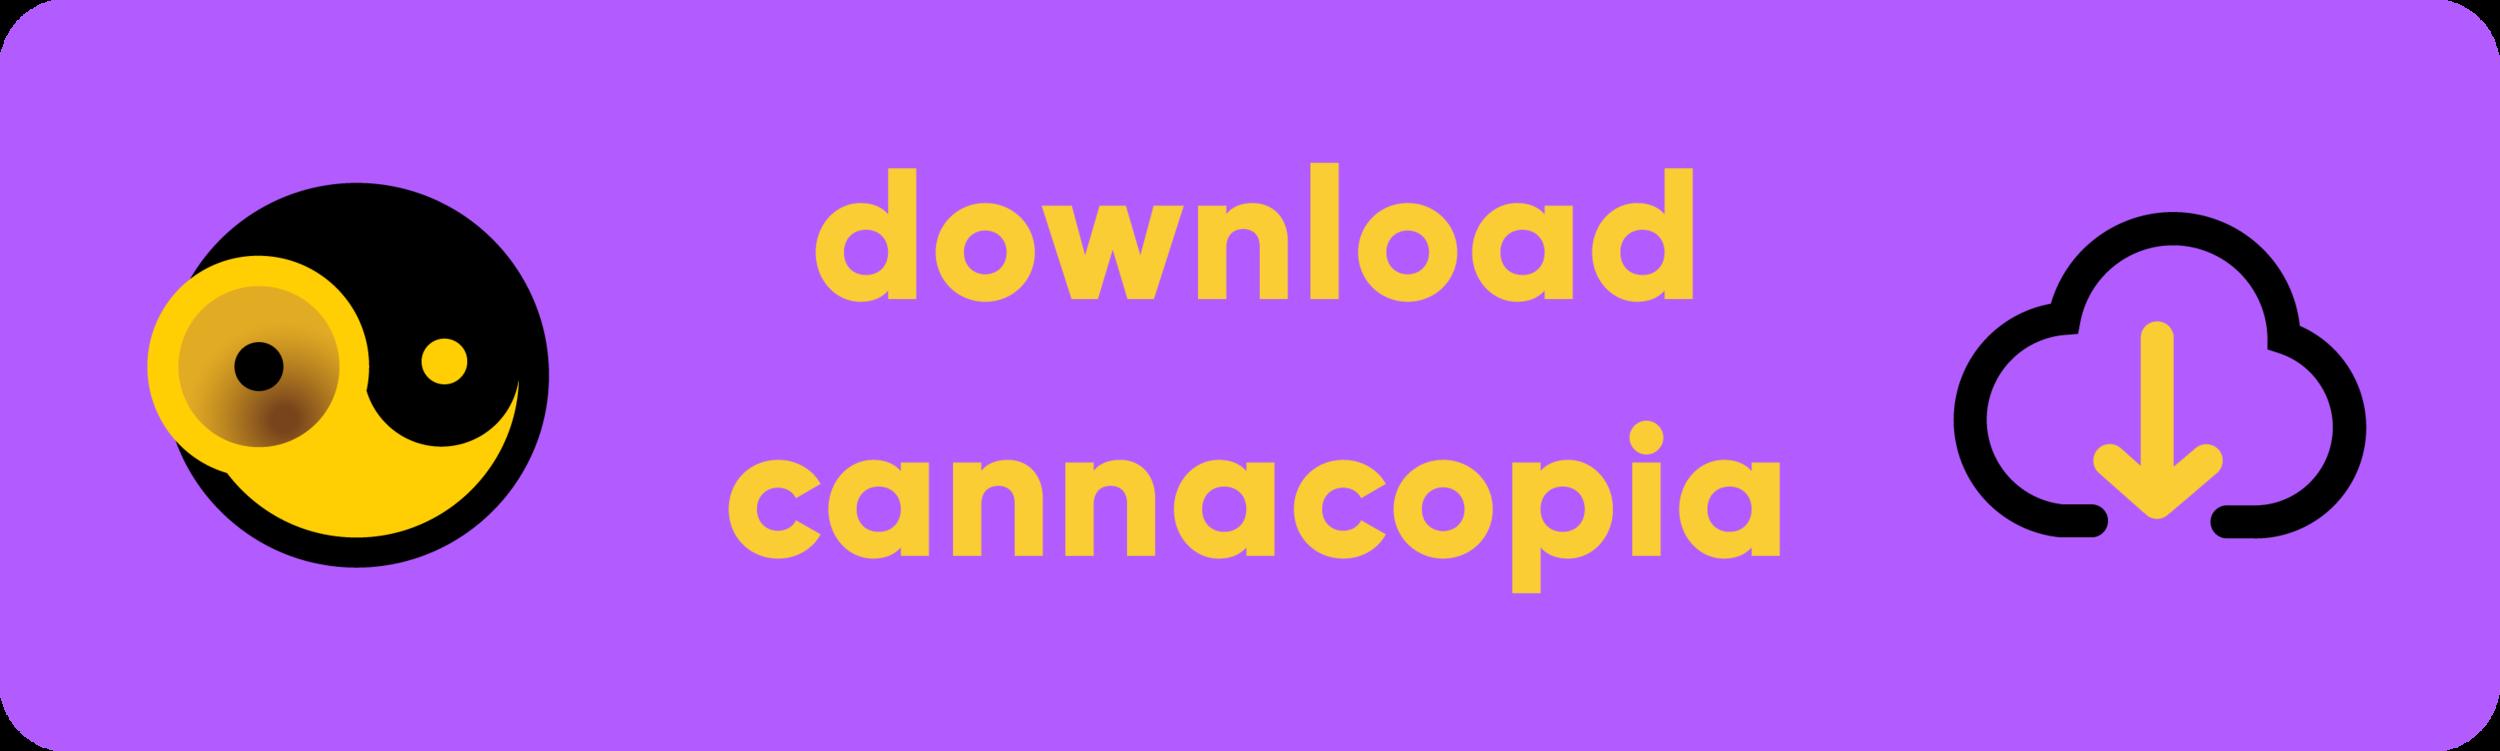 downloadcanna-03.png